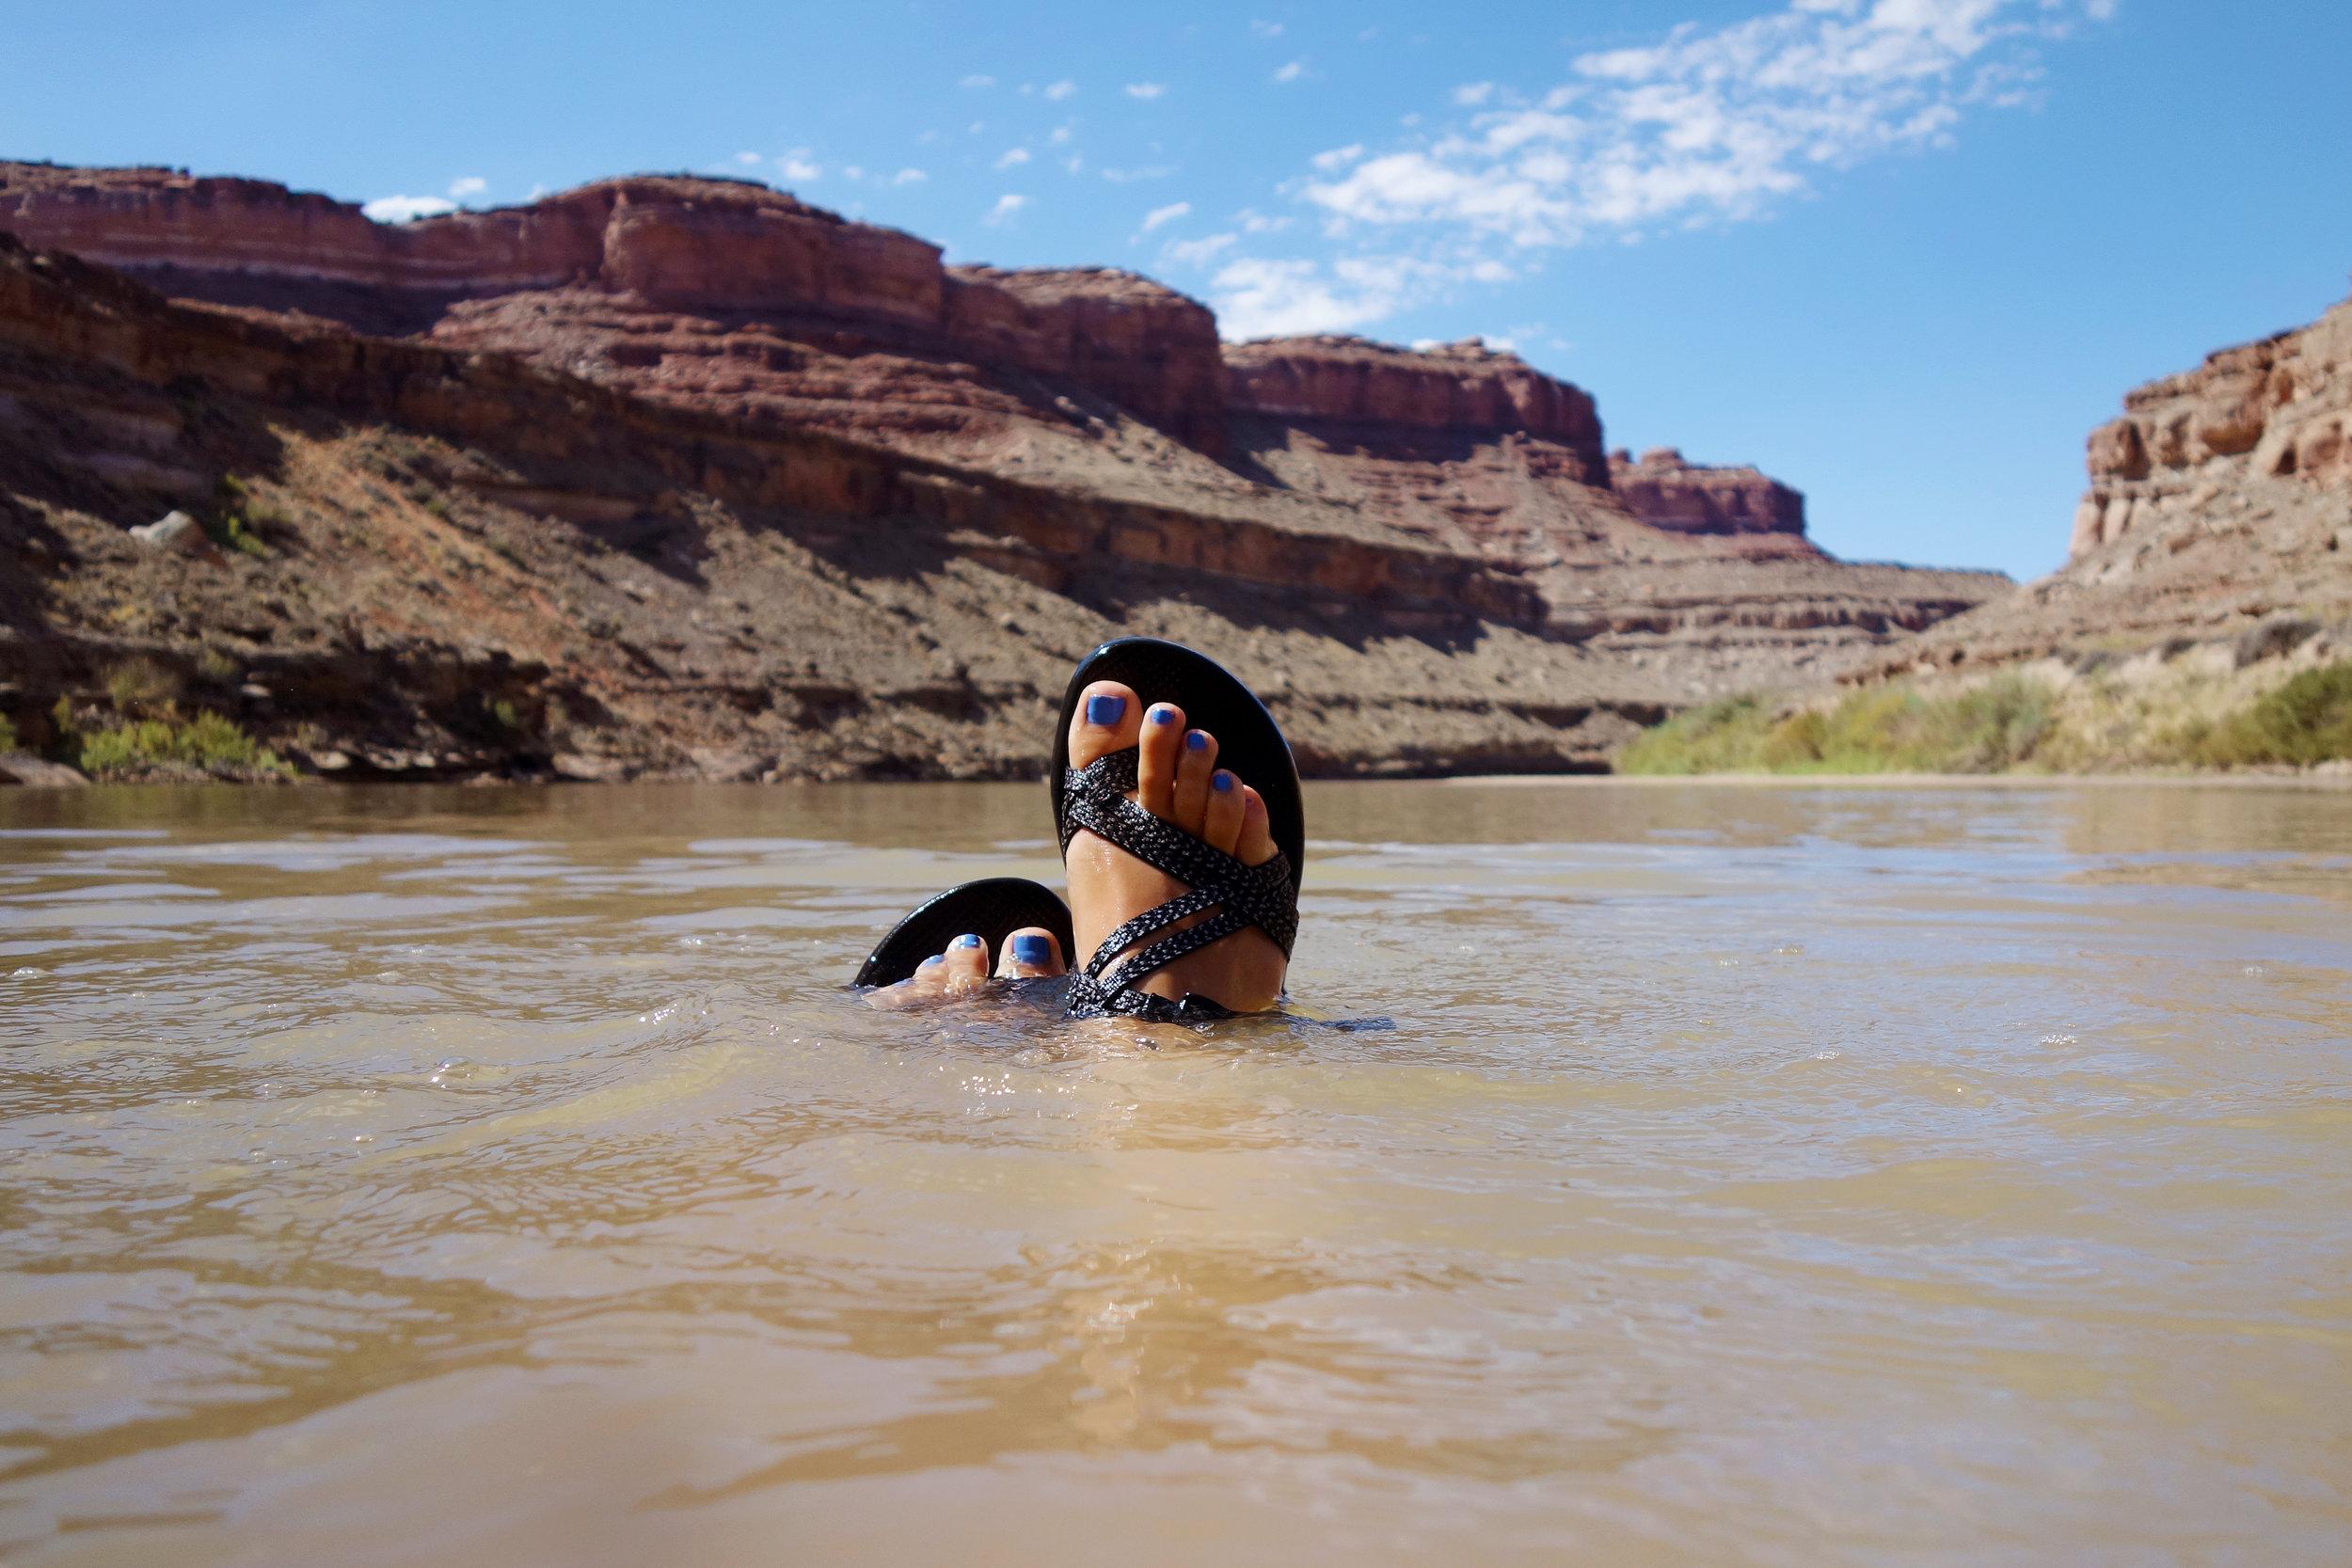 Cataract Canyon September 2018 - MT Sobek - Photos by Laura Hughes (11).jpg